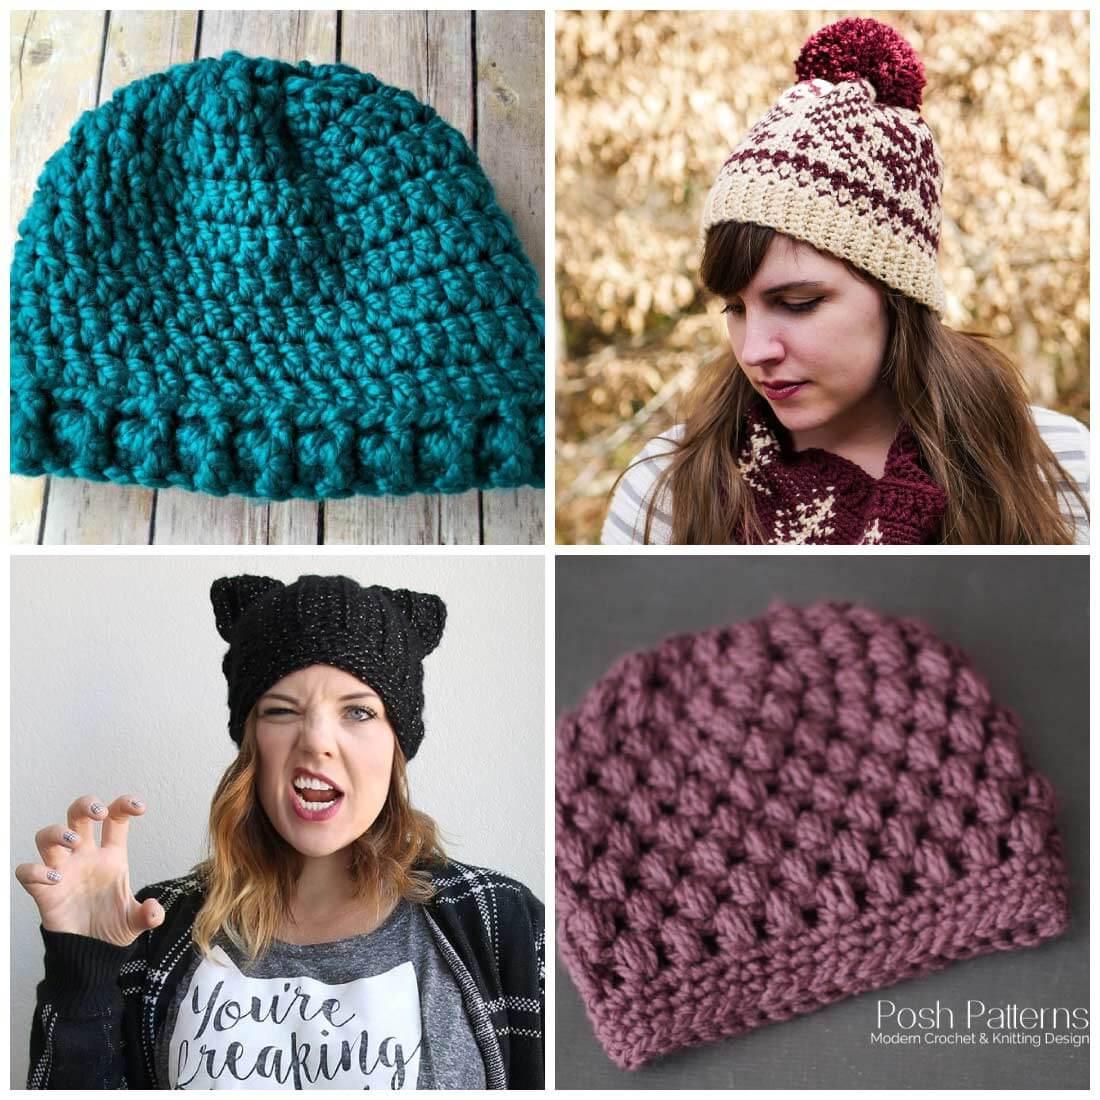 free crochet hat patterns | free crochet patterns | crochet patterns | use znkcsol